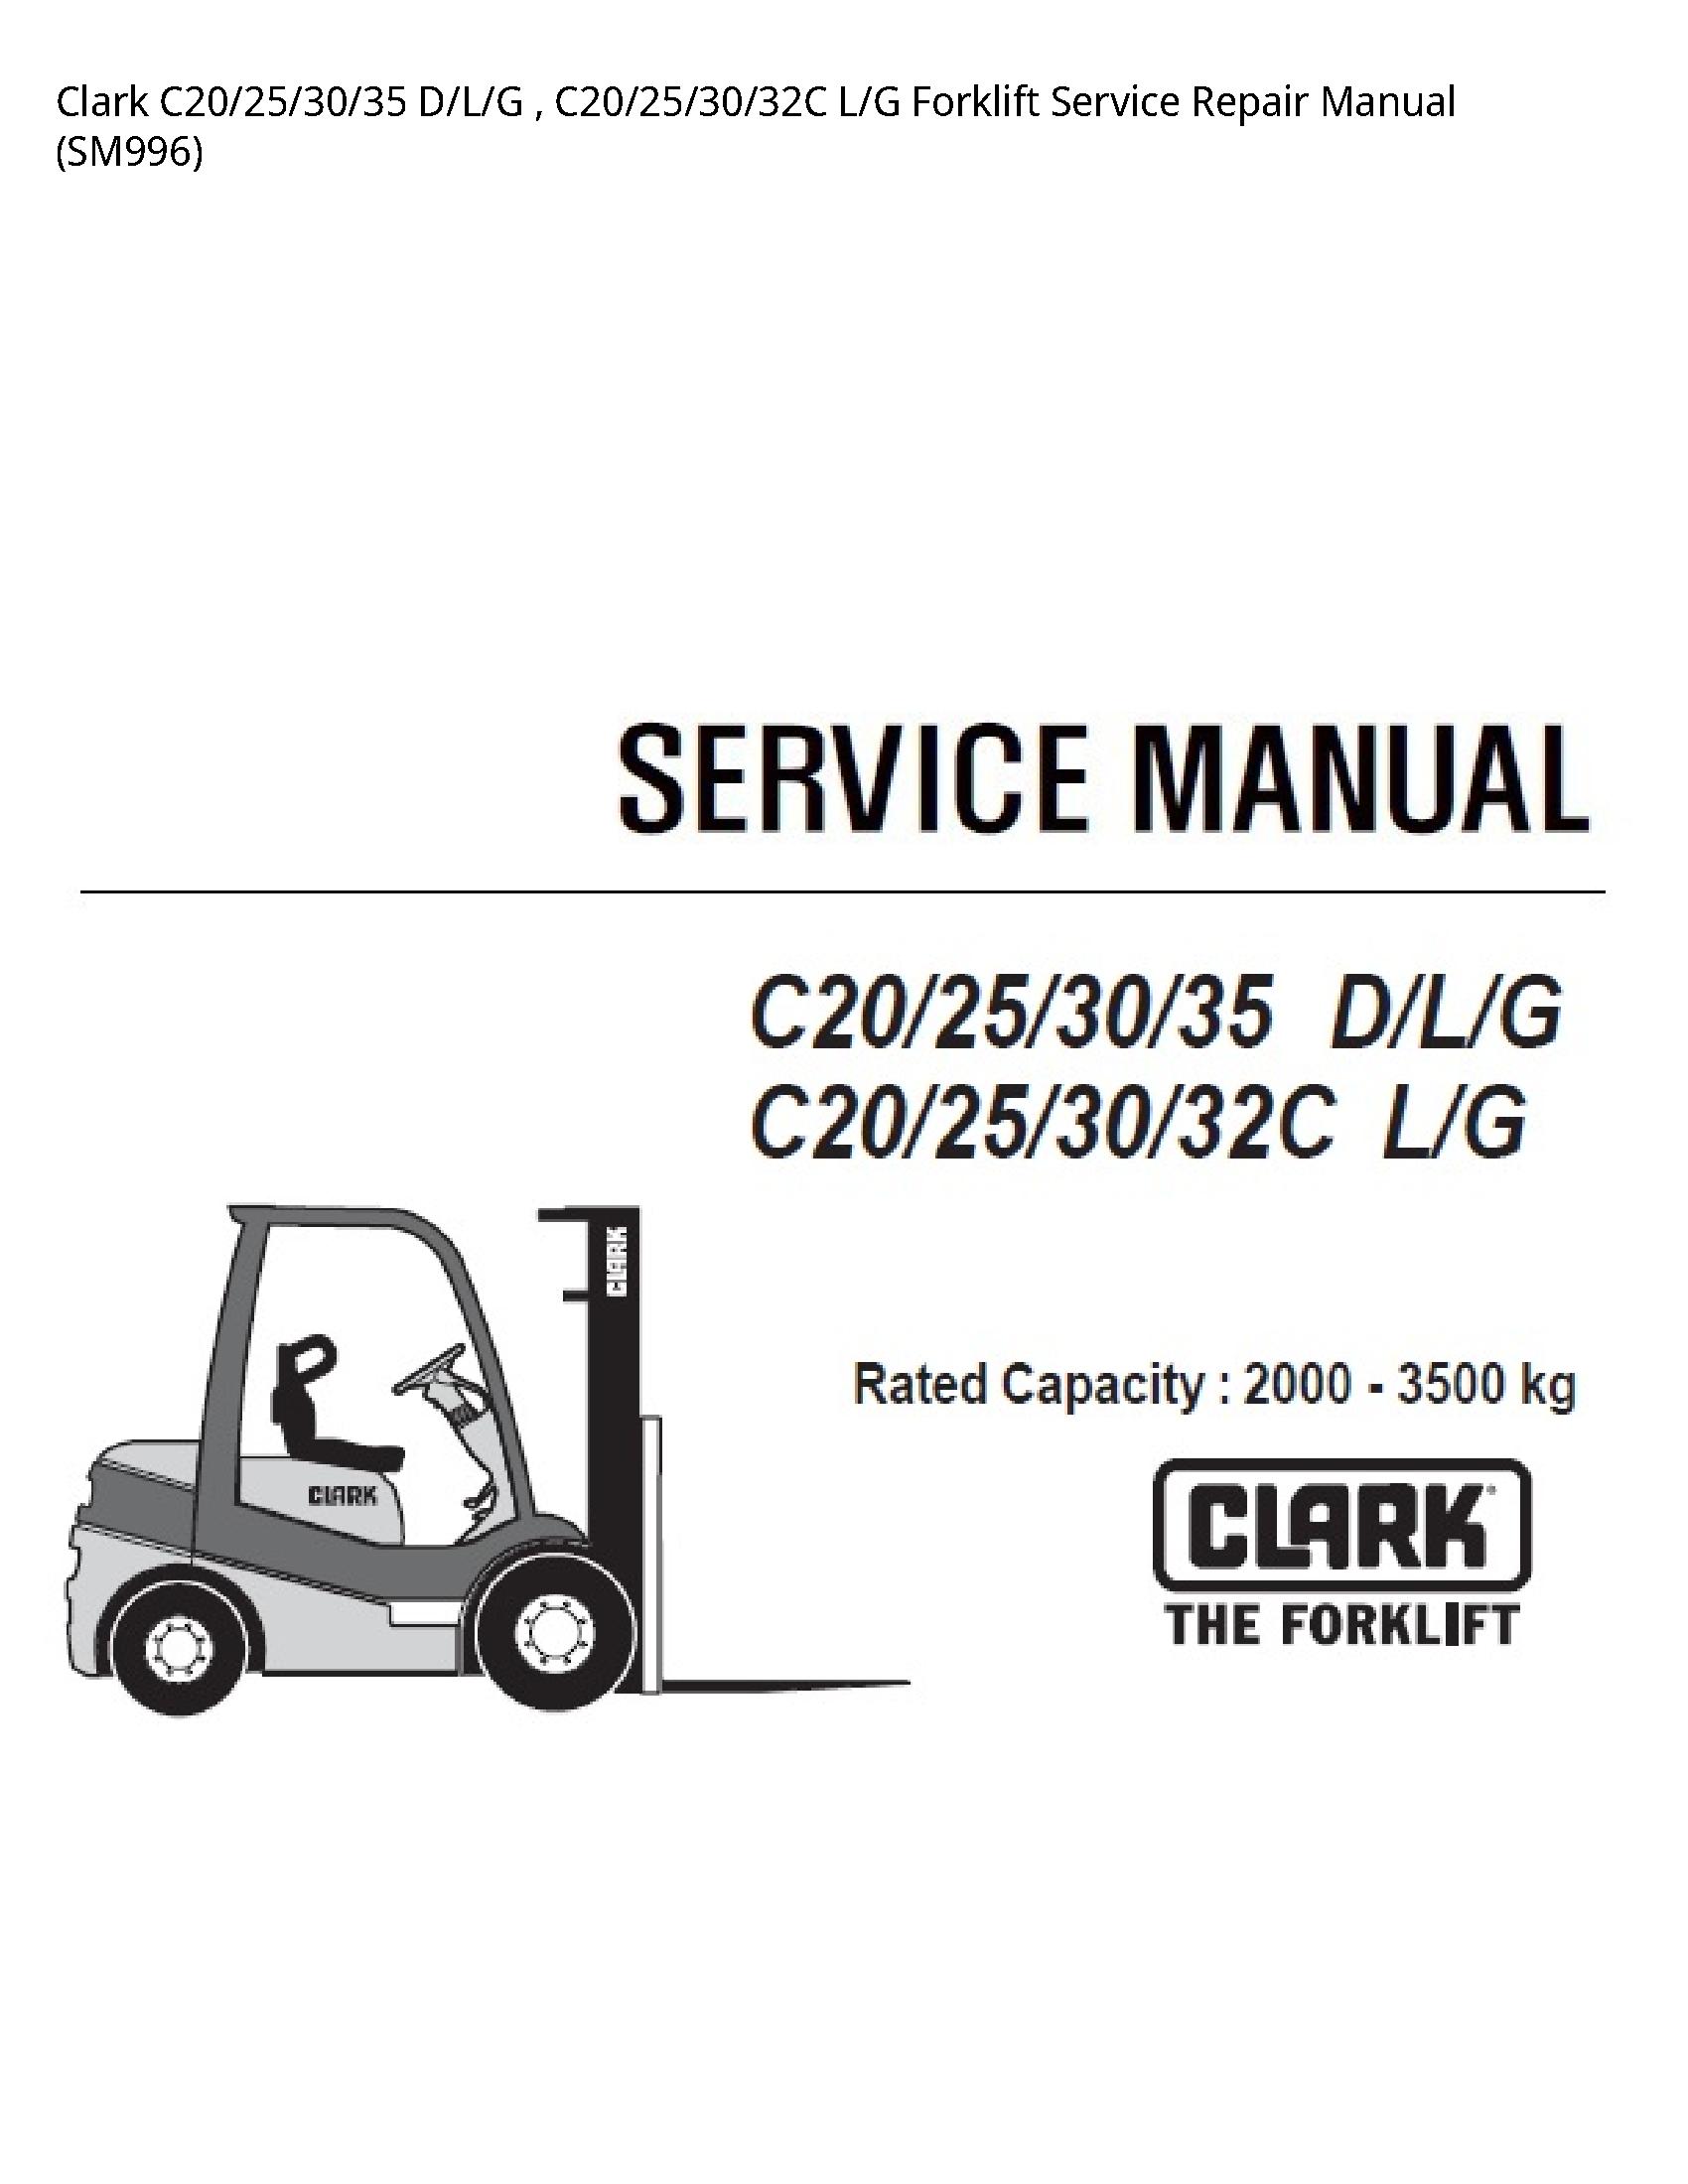 Clark C20 D/L/G L/G Forklift manual